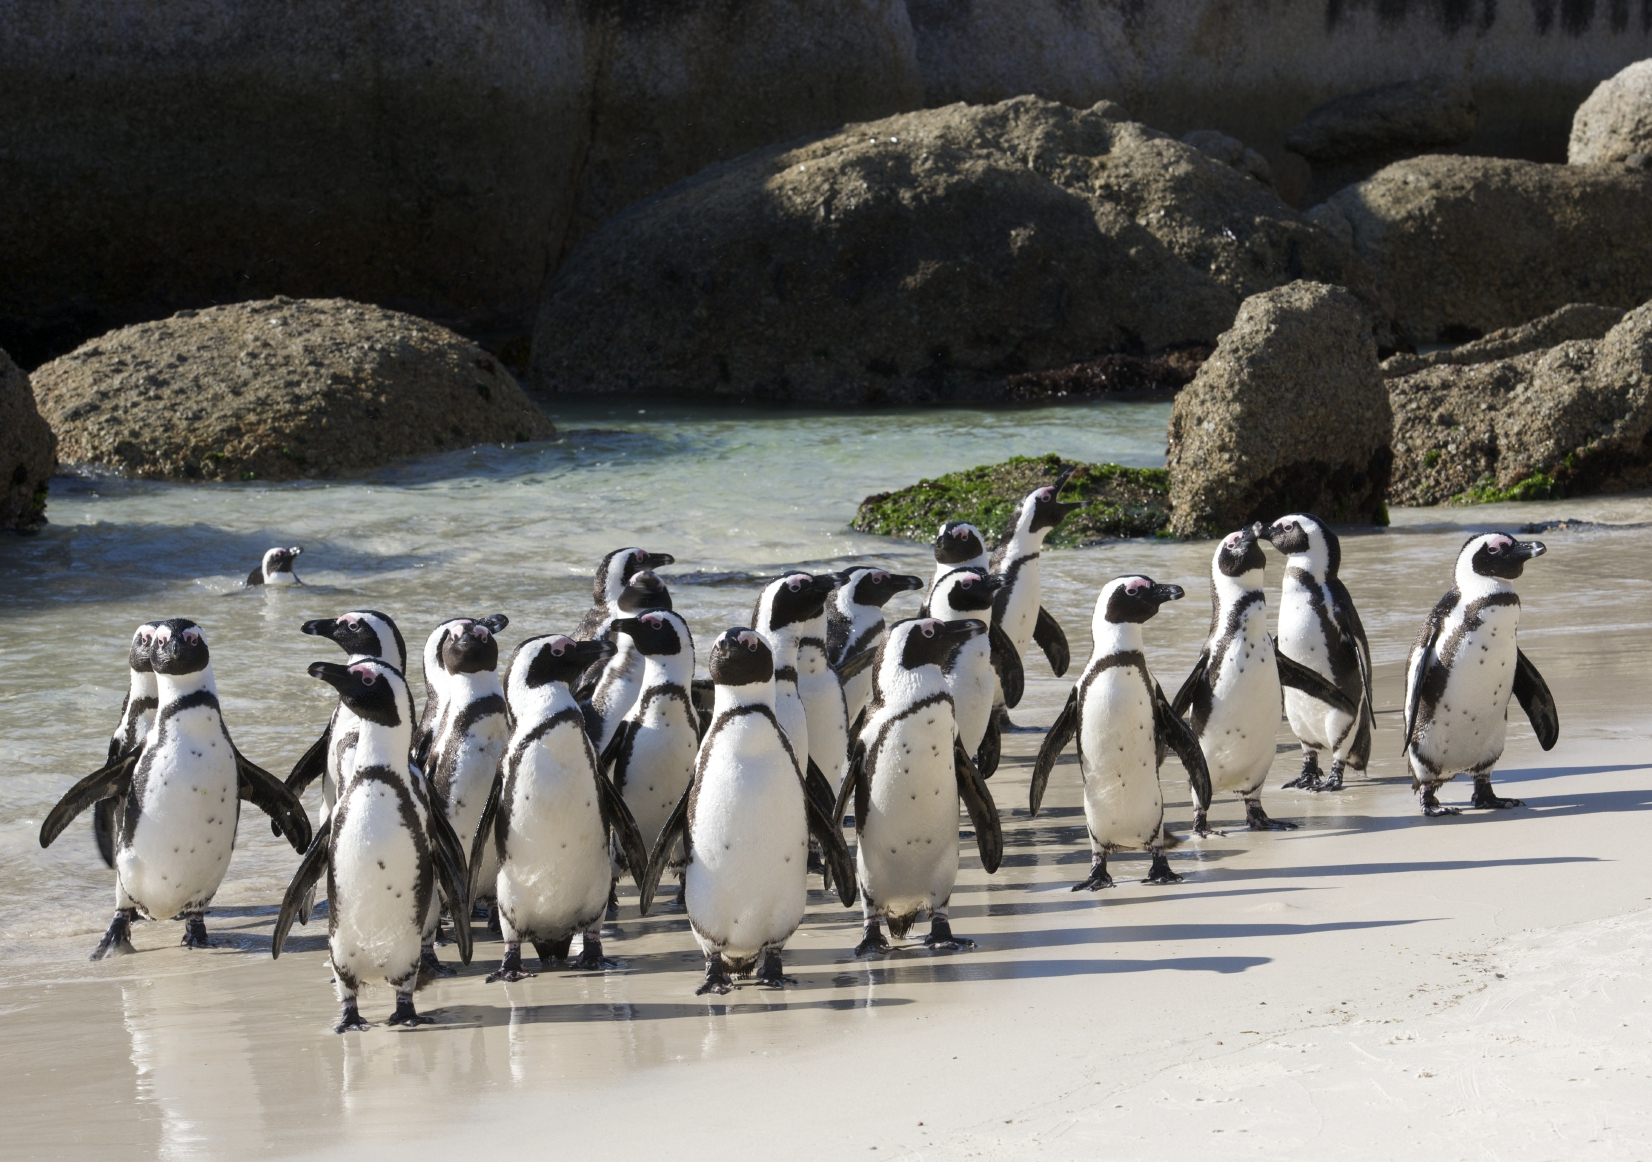 Penguin Group - iStock_000045395110_Medium